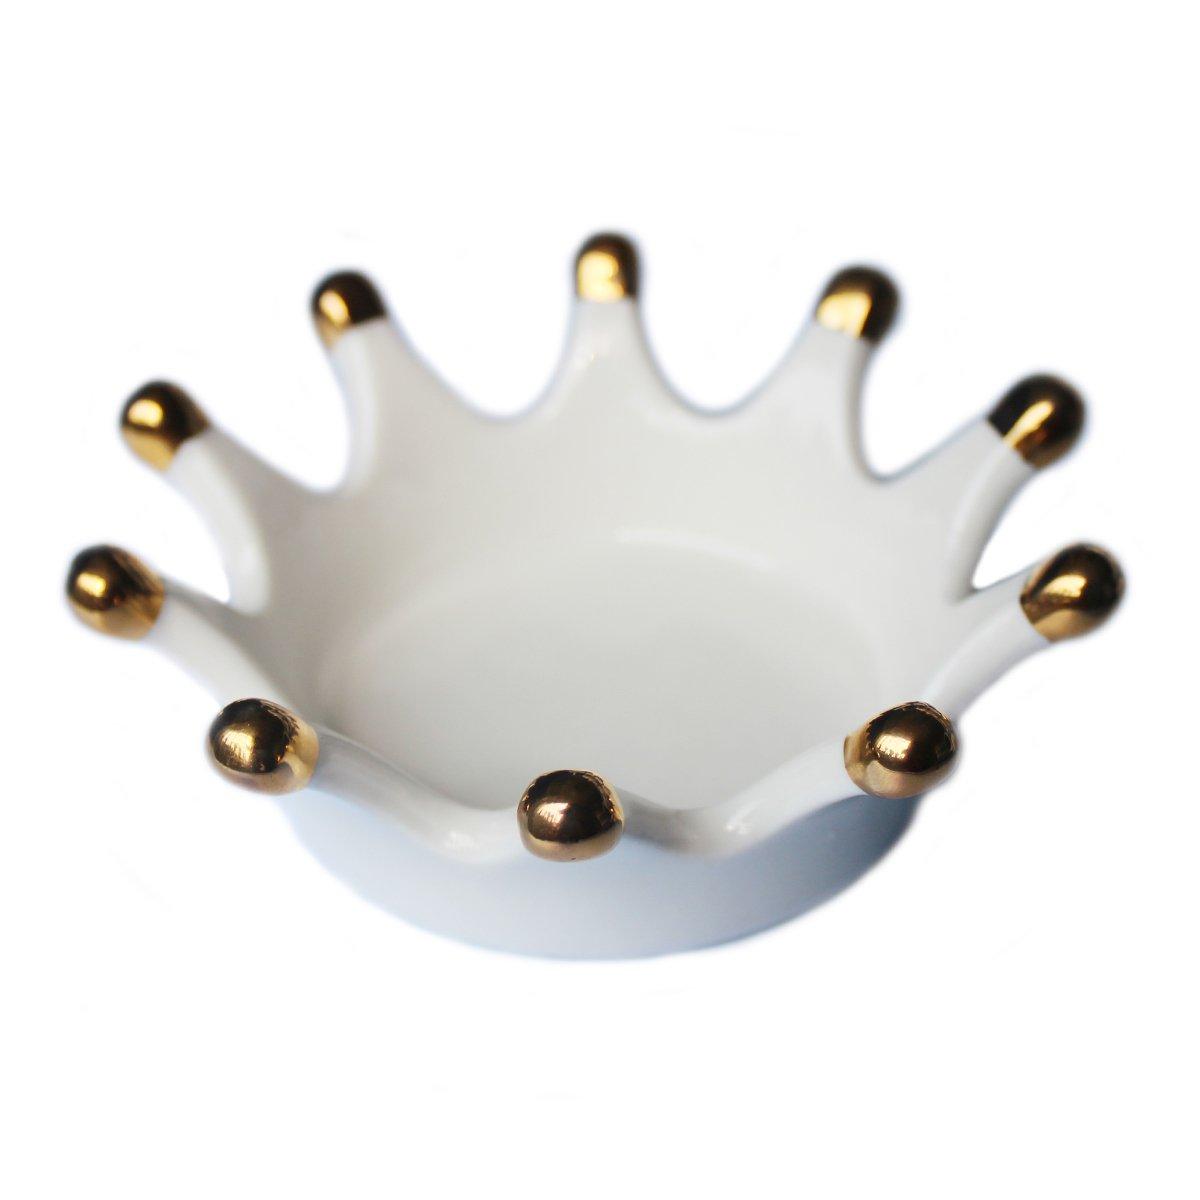 Ceramic Ring Holder Crown Shape Tray Cute Organizer Plate Trinkets Organizer